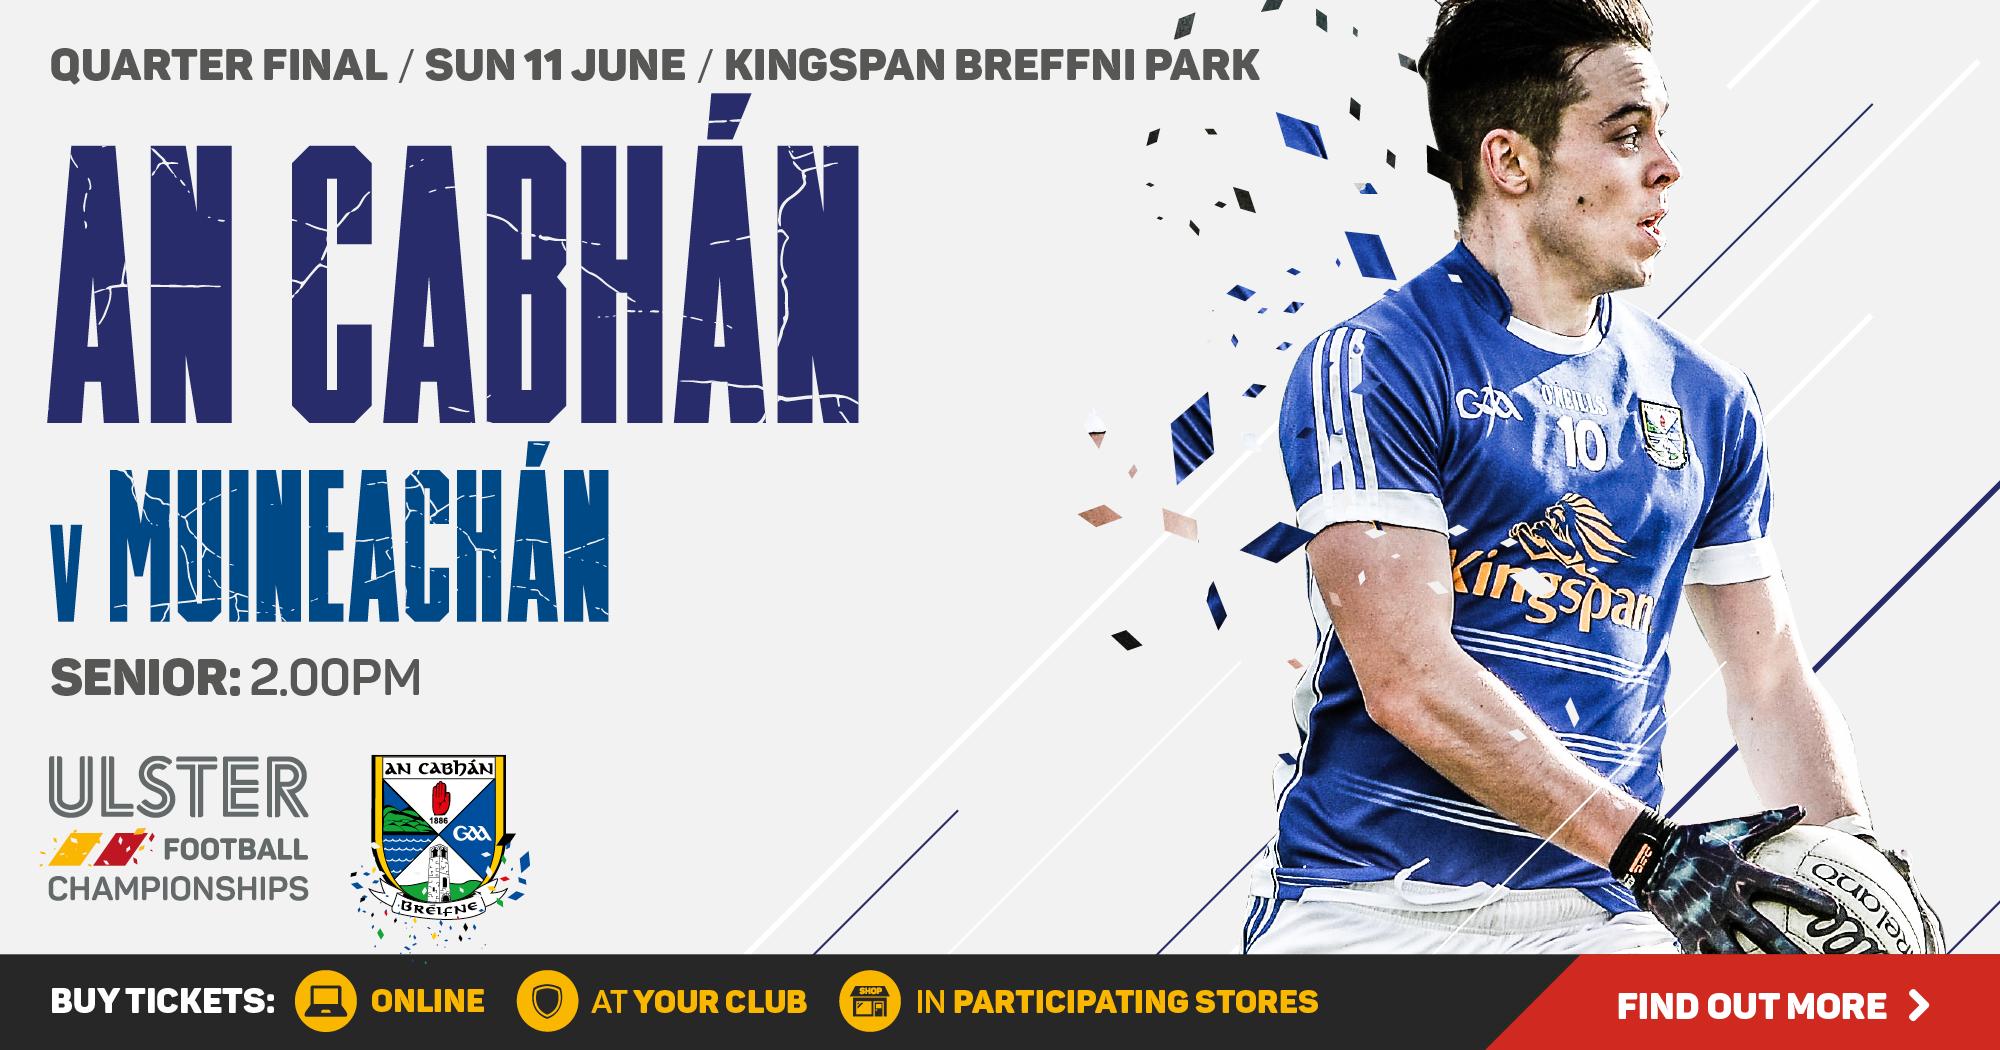 Ulster Football Championship 2017 - Quarter Final - Monaghan v Cavan